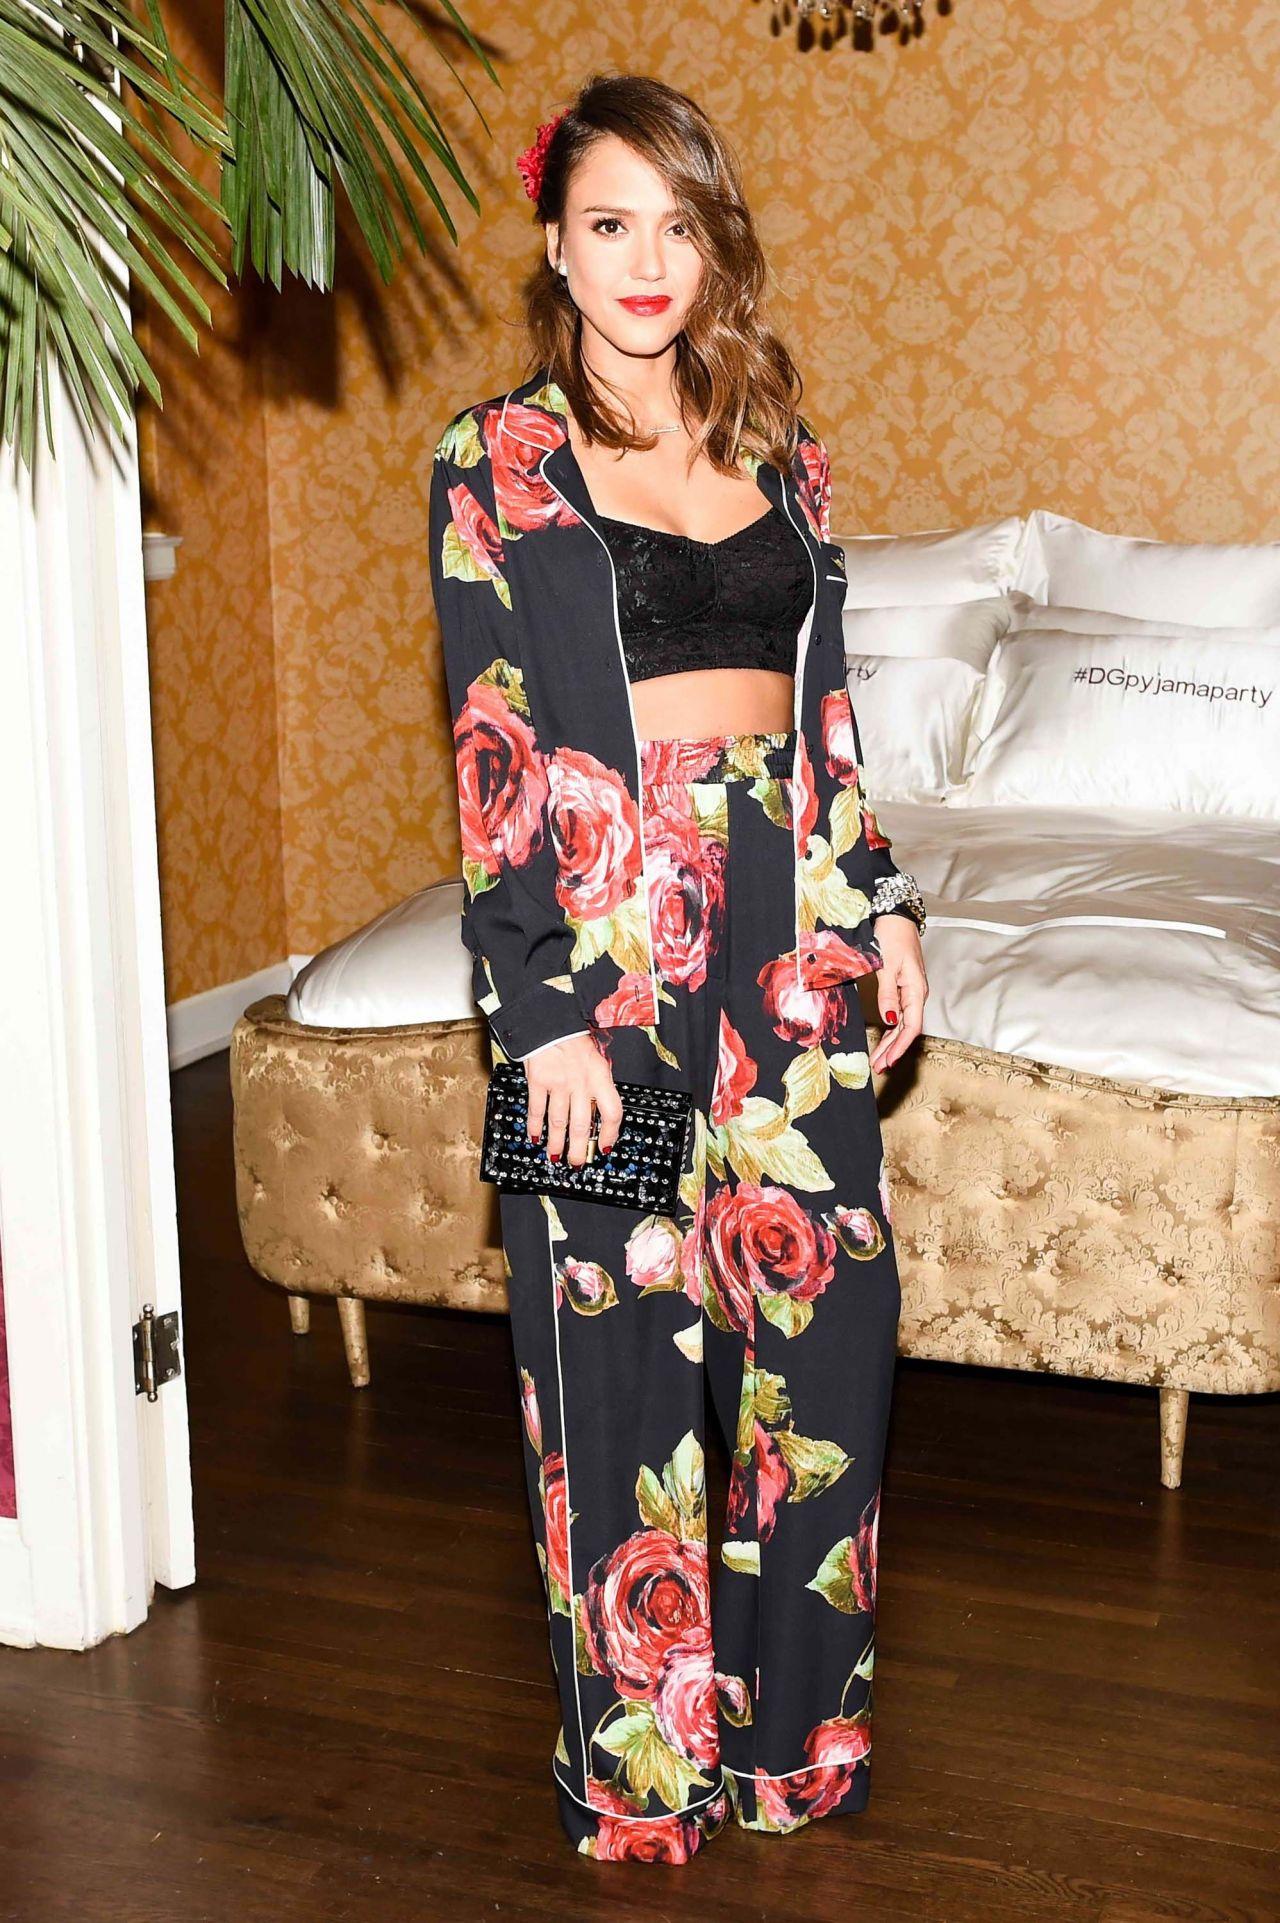 2de0f0eb57eb Jessica Alba - Dolce   Gabbana Pyjama Party in Los Angeles